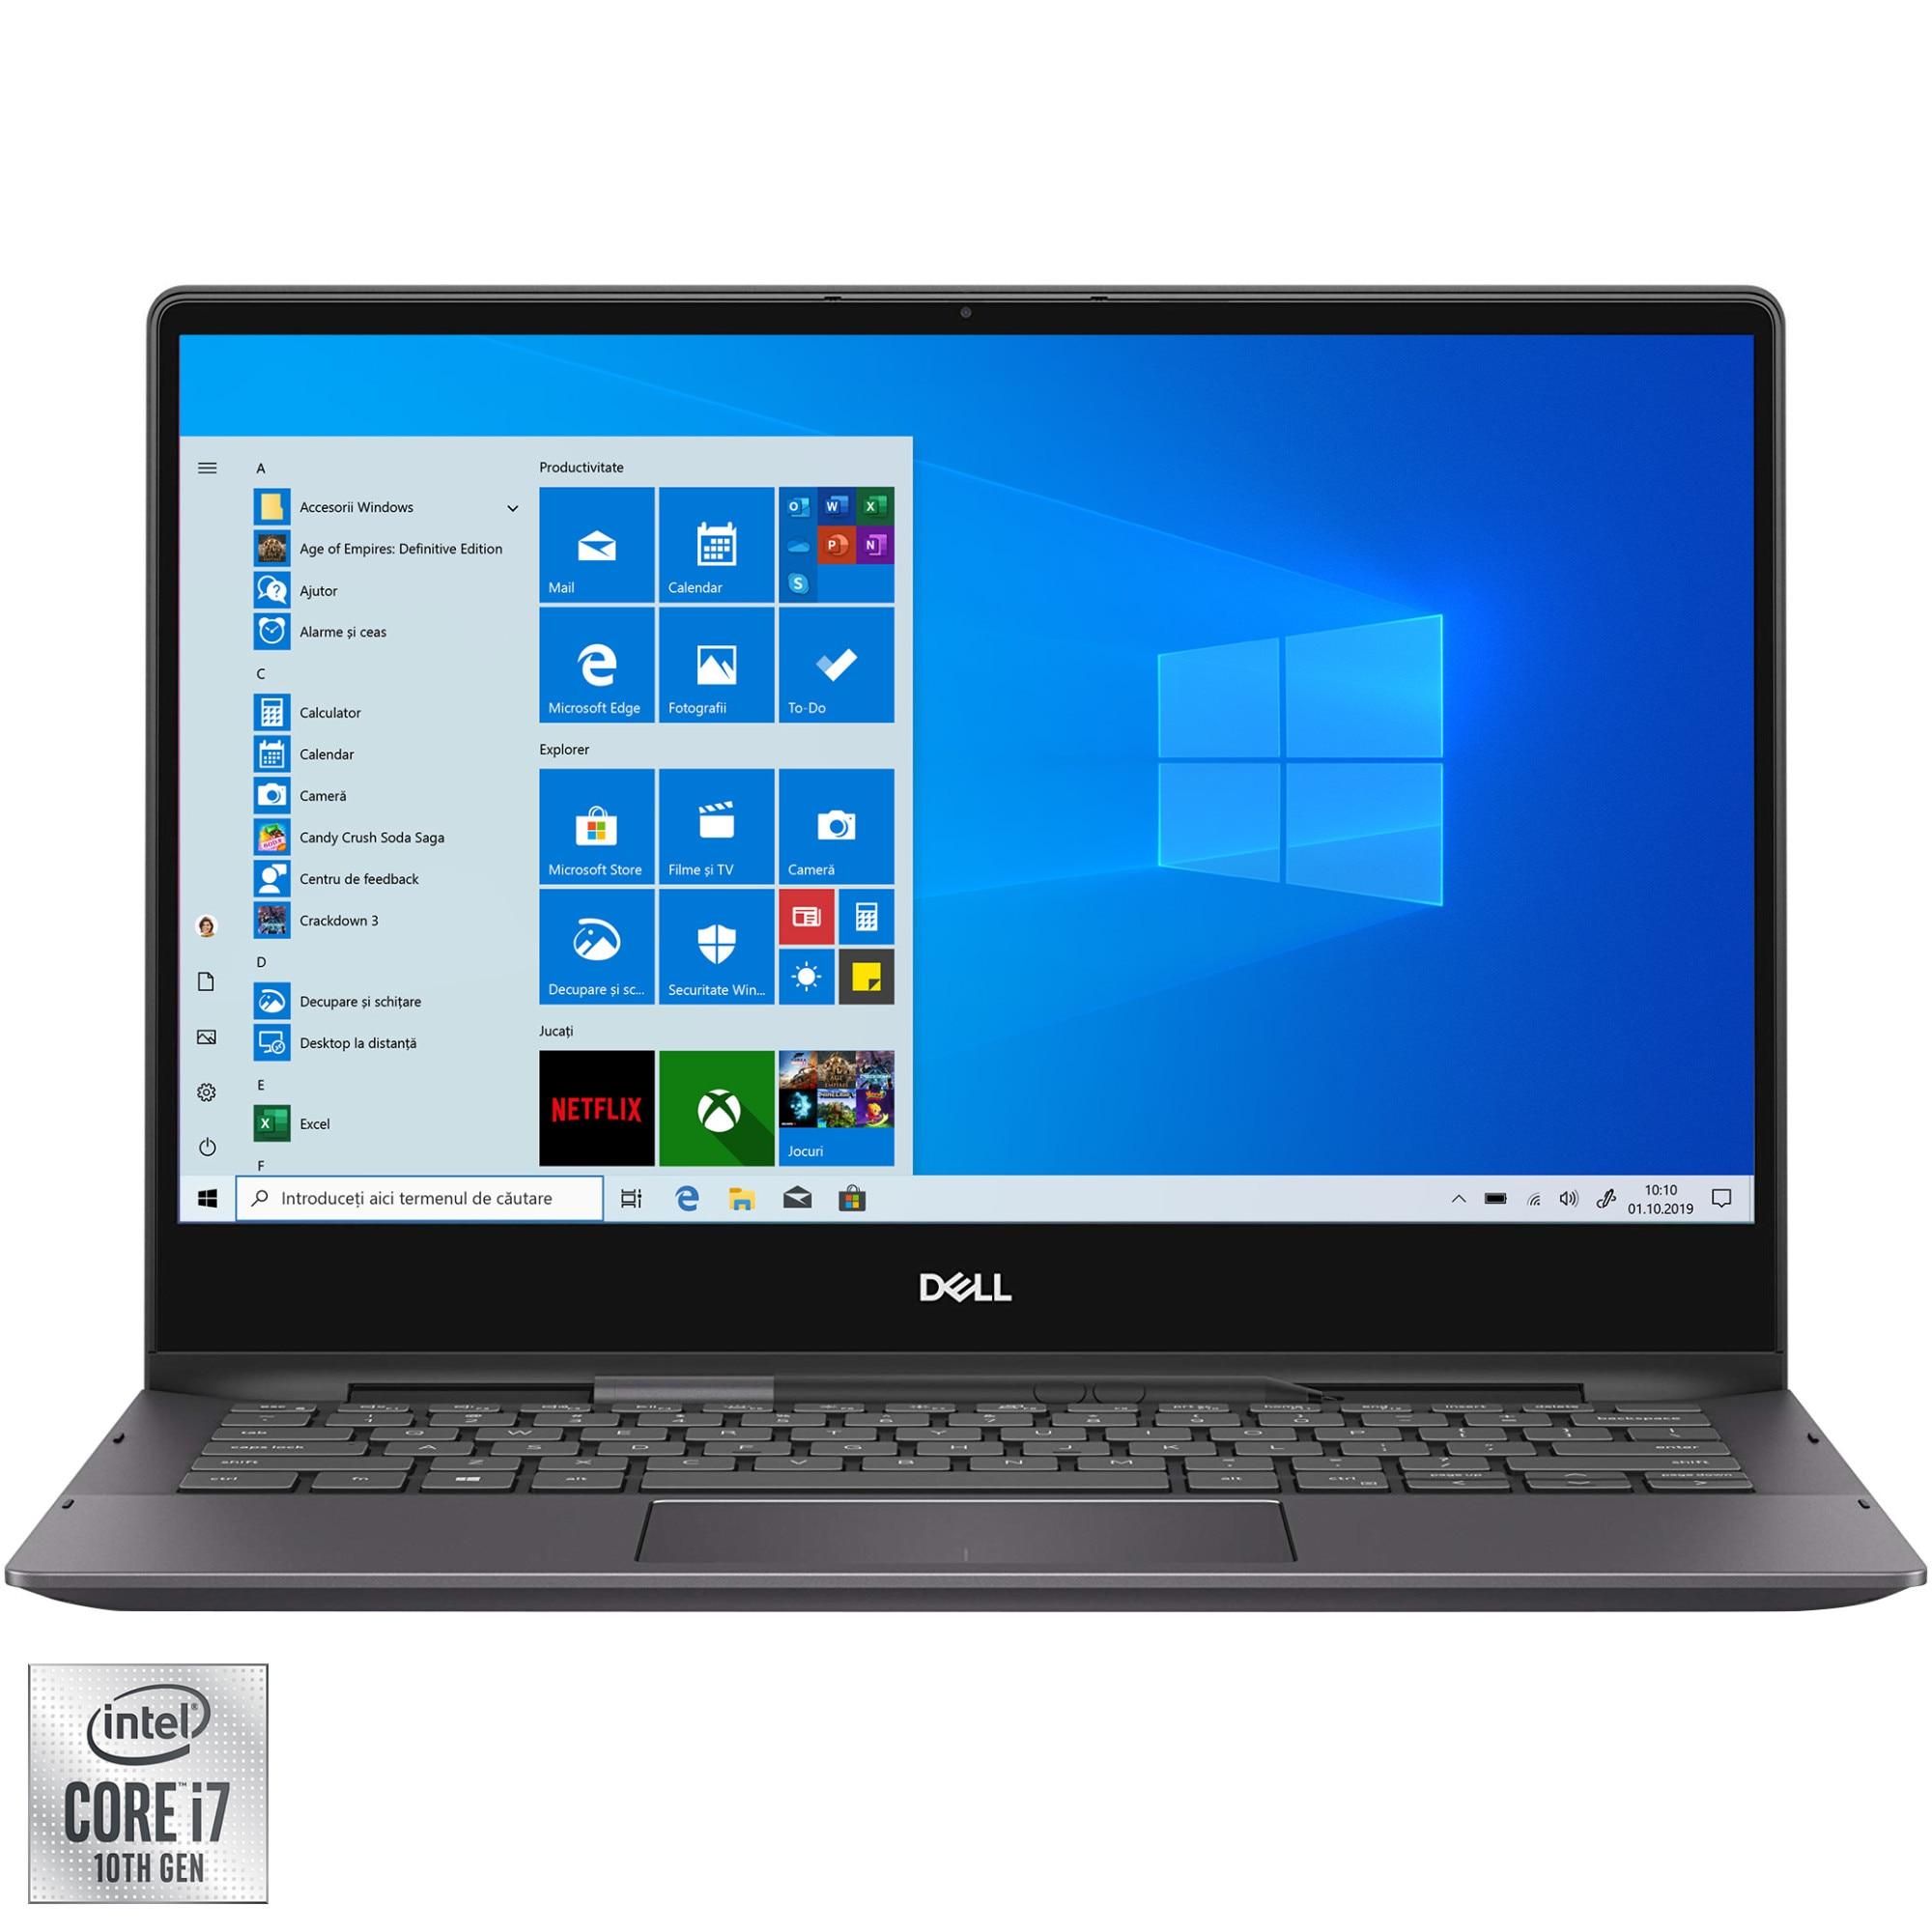 "Fotografie Laptop 2 in 1 Dell Inspiron 13 7391 cu procesor Intel Core i7-10510U pana la 4.90 GHz, 13.3"", UHD, Touch, 16GB, 512GB SSD, Intel UHD Graphics 620, Windows 10 Pro, Black"